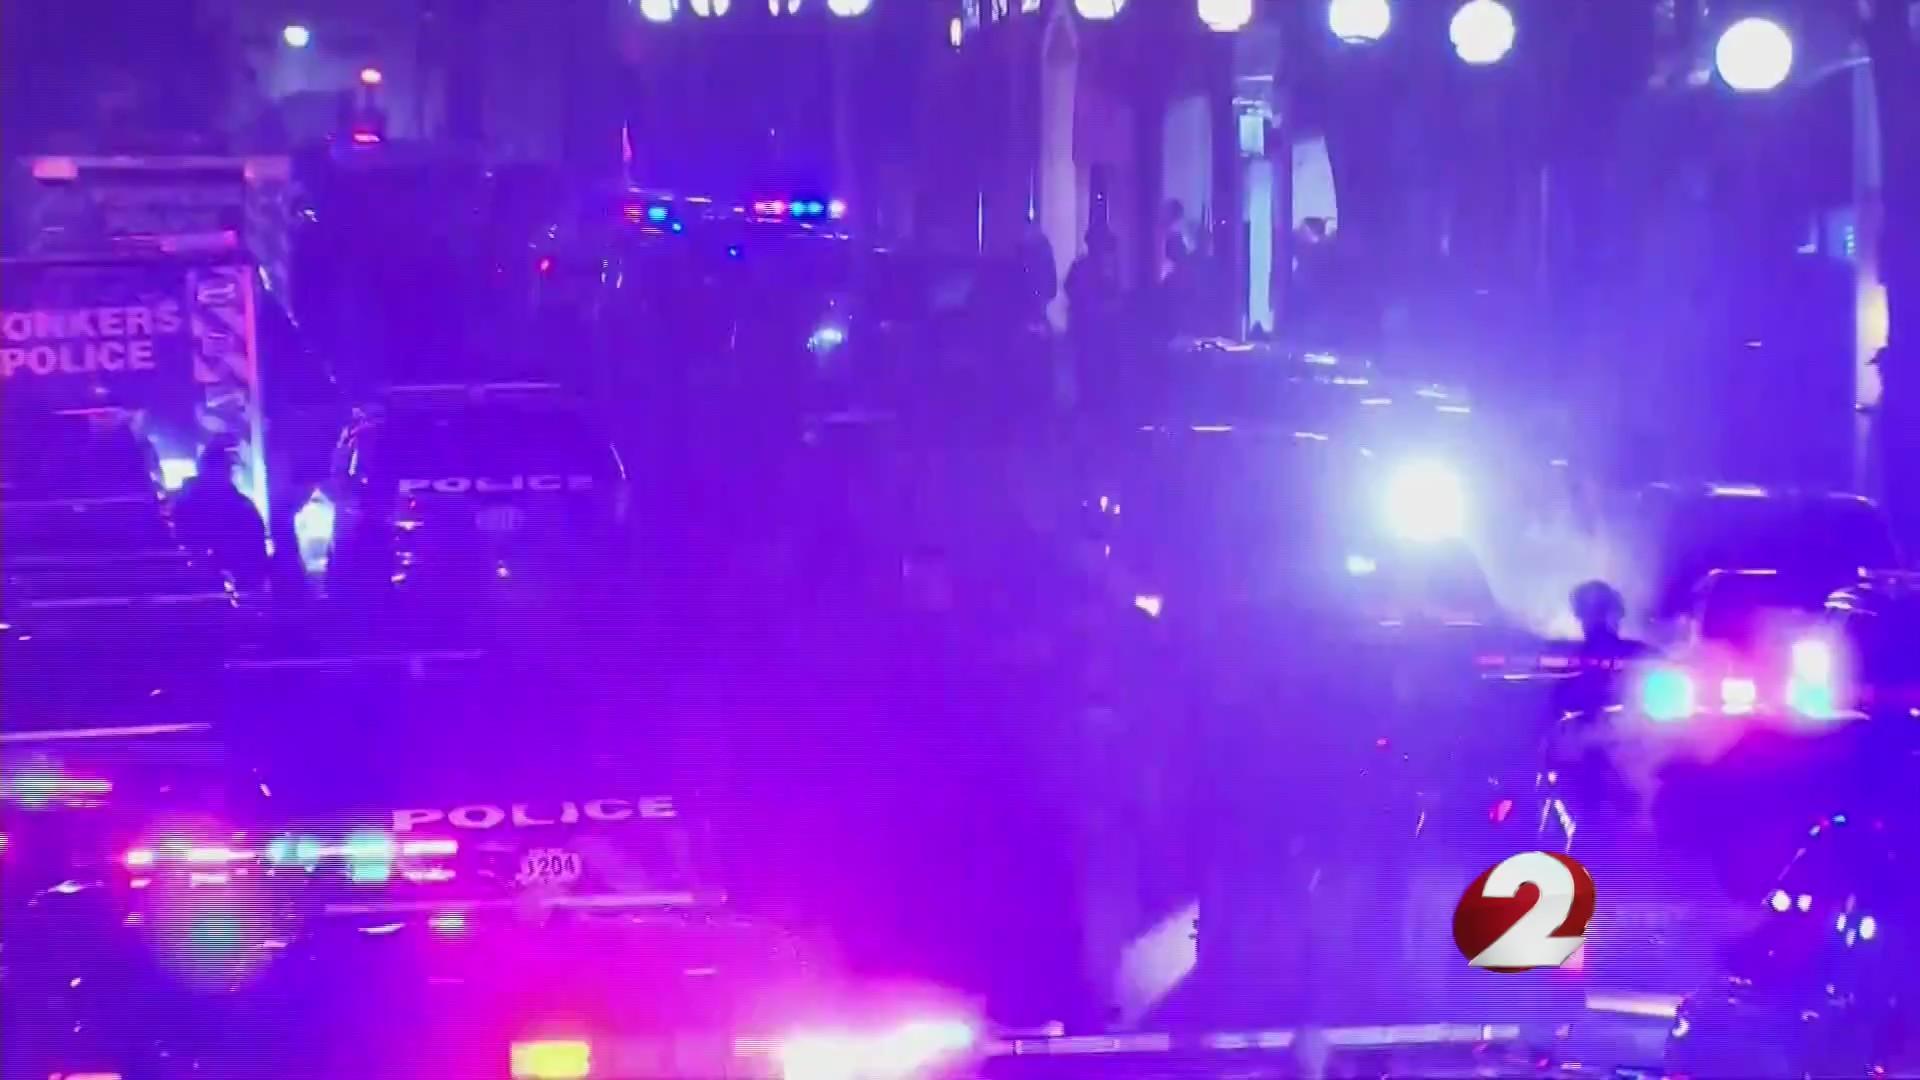 False alarm prompts massive police presence at NY hospital